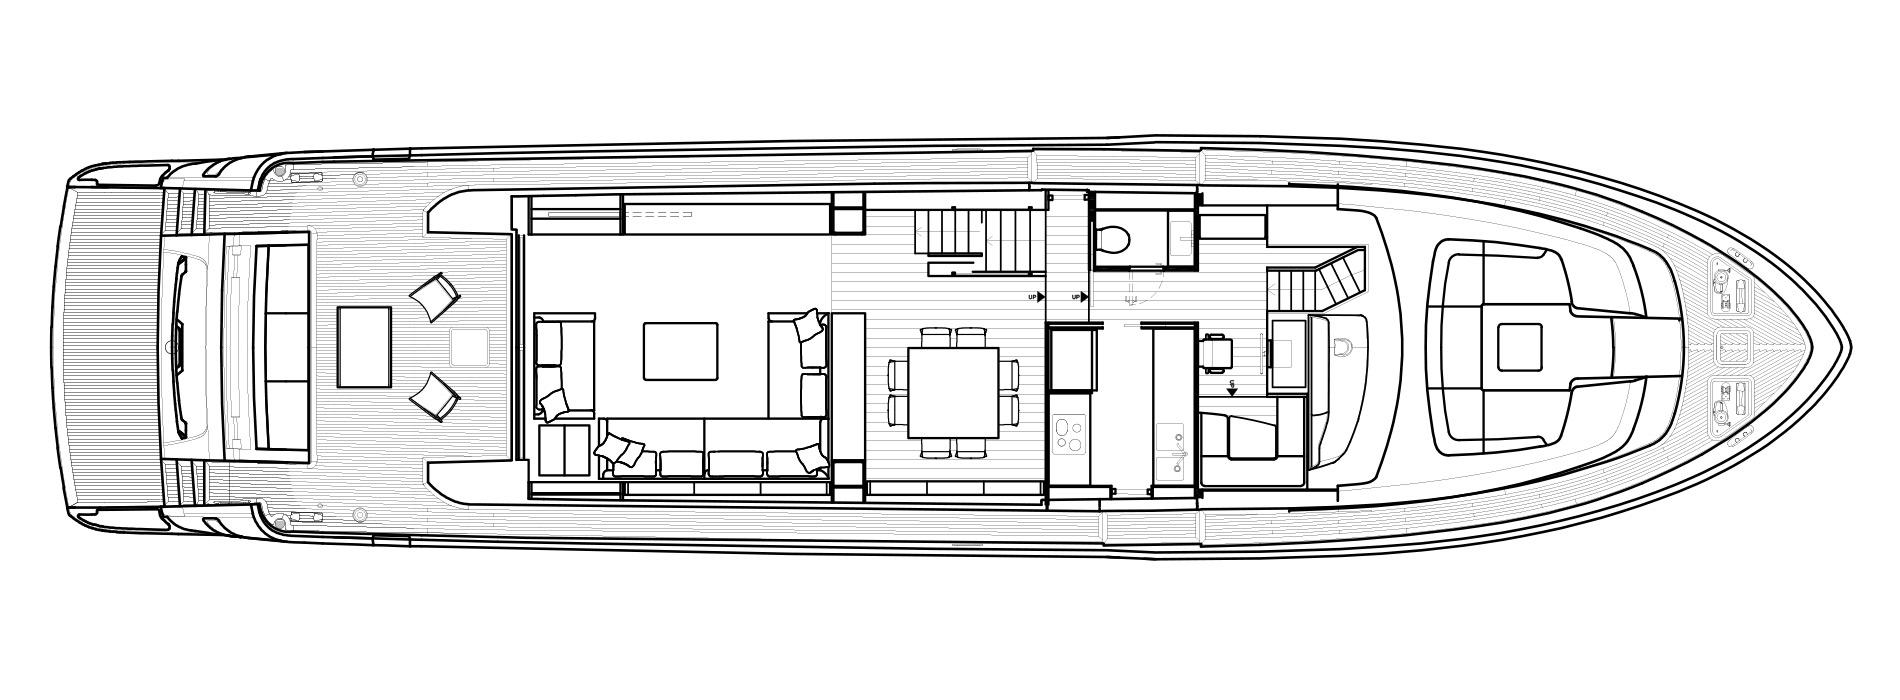 Sanlorenzo Yachts SL86 Hauptdeck Versione A